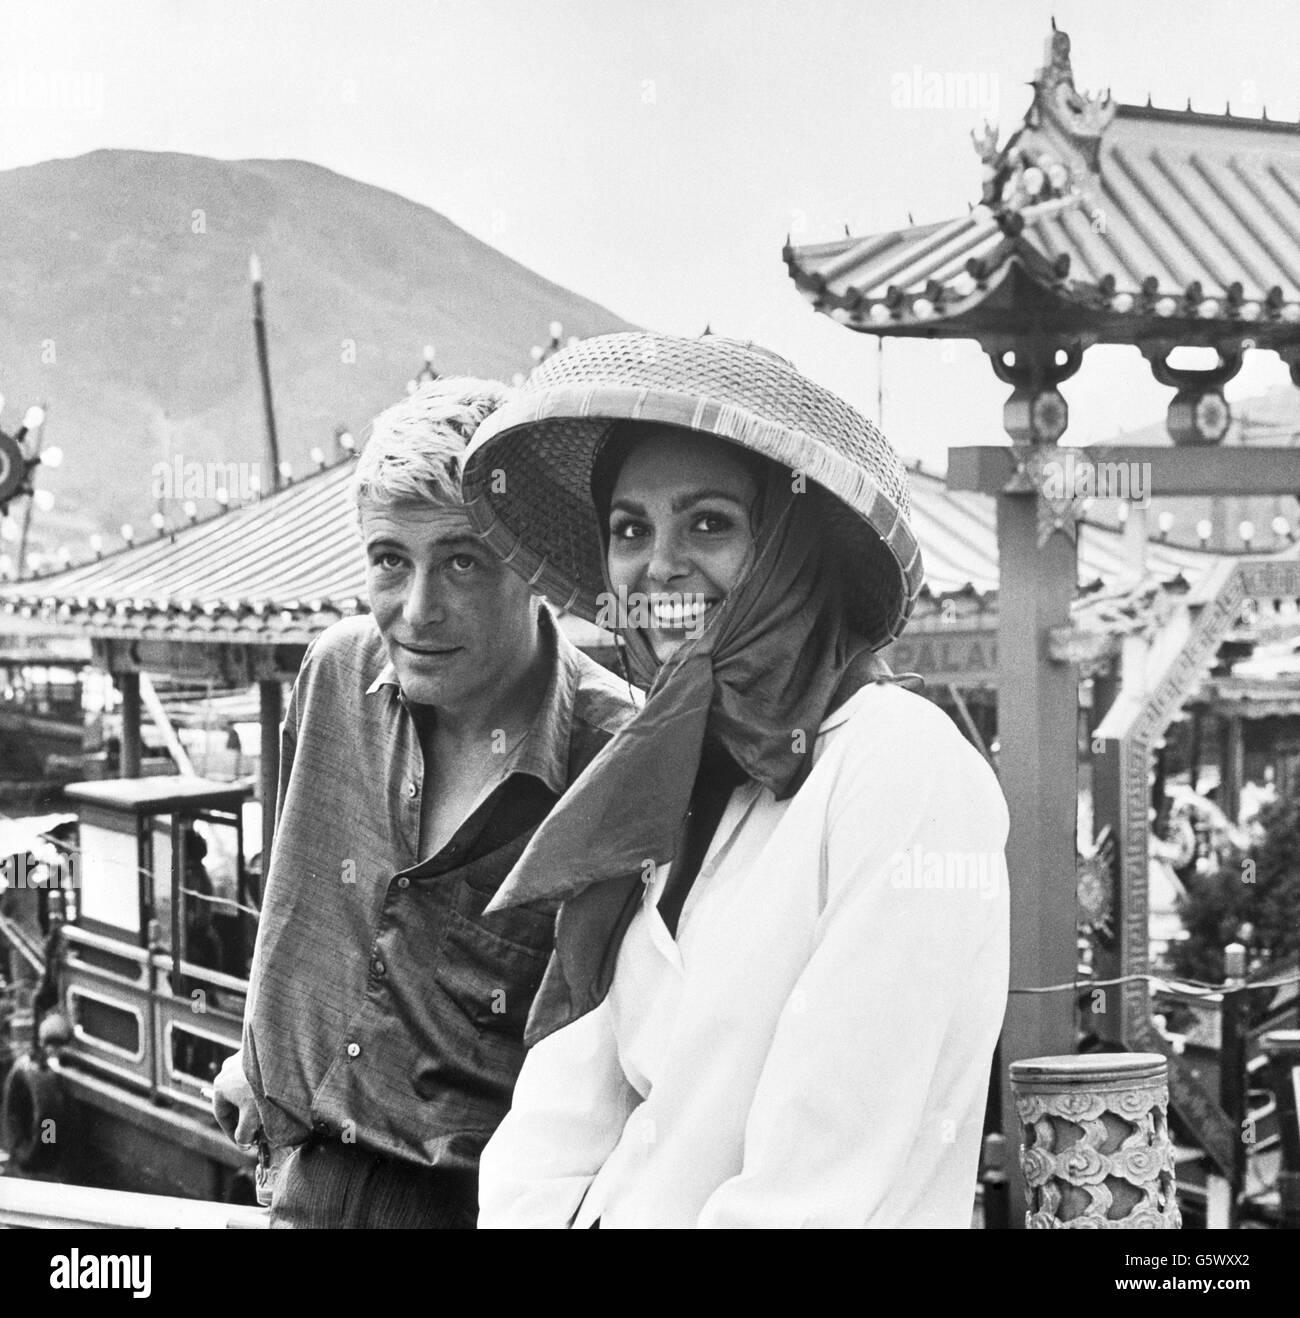 Entertainment - Film - Lord Jim - Dahlia Lavi with Peter O'Toole - Hong Kong - Stock Image